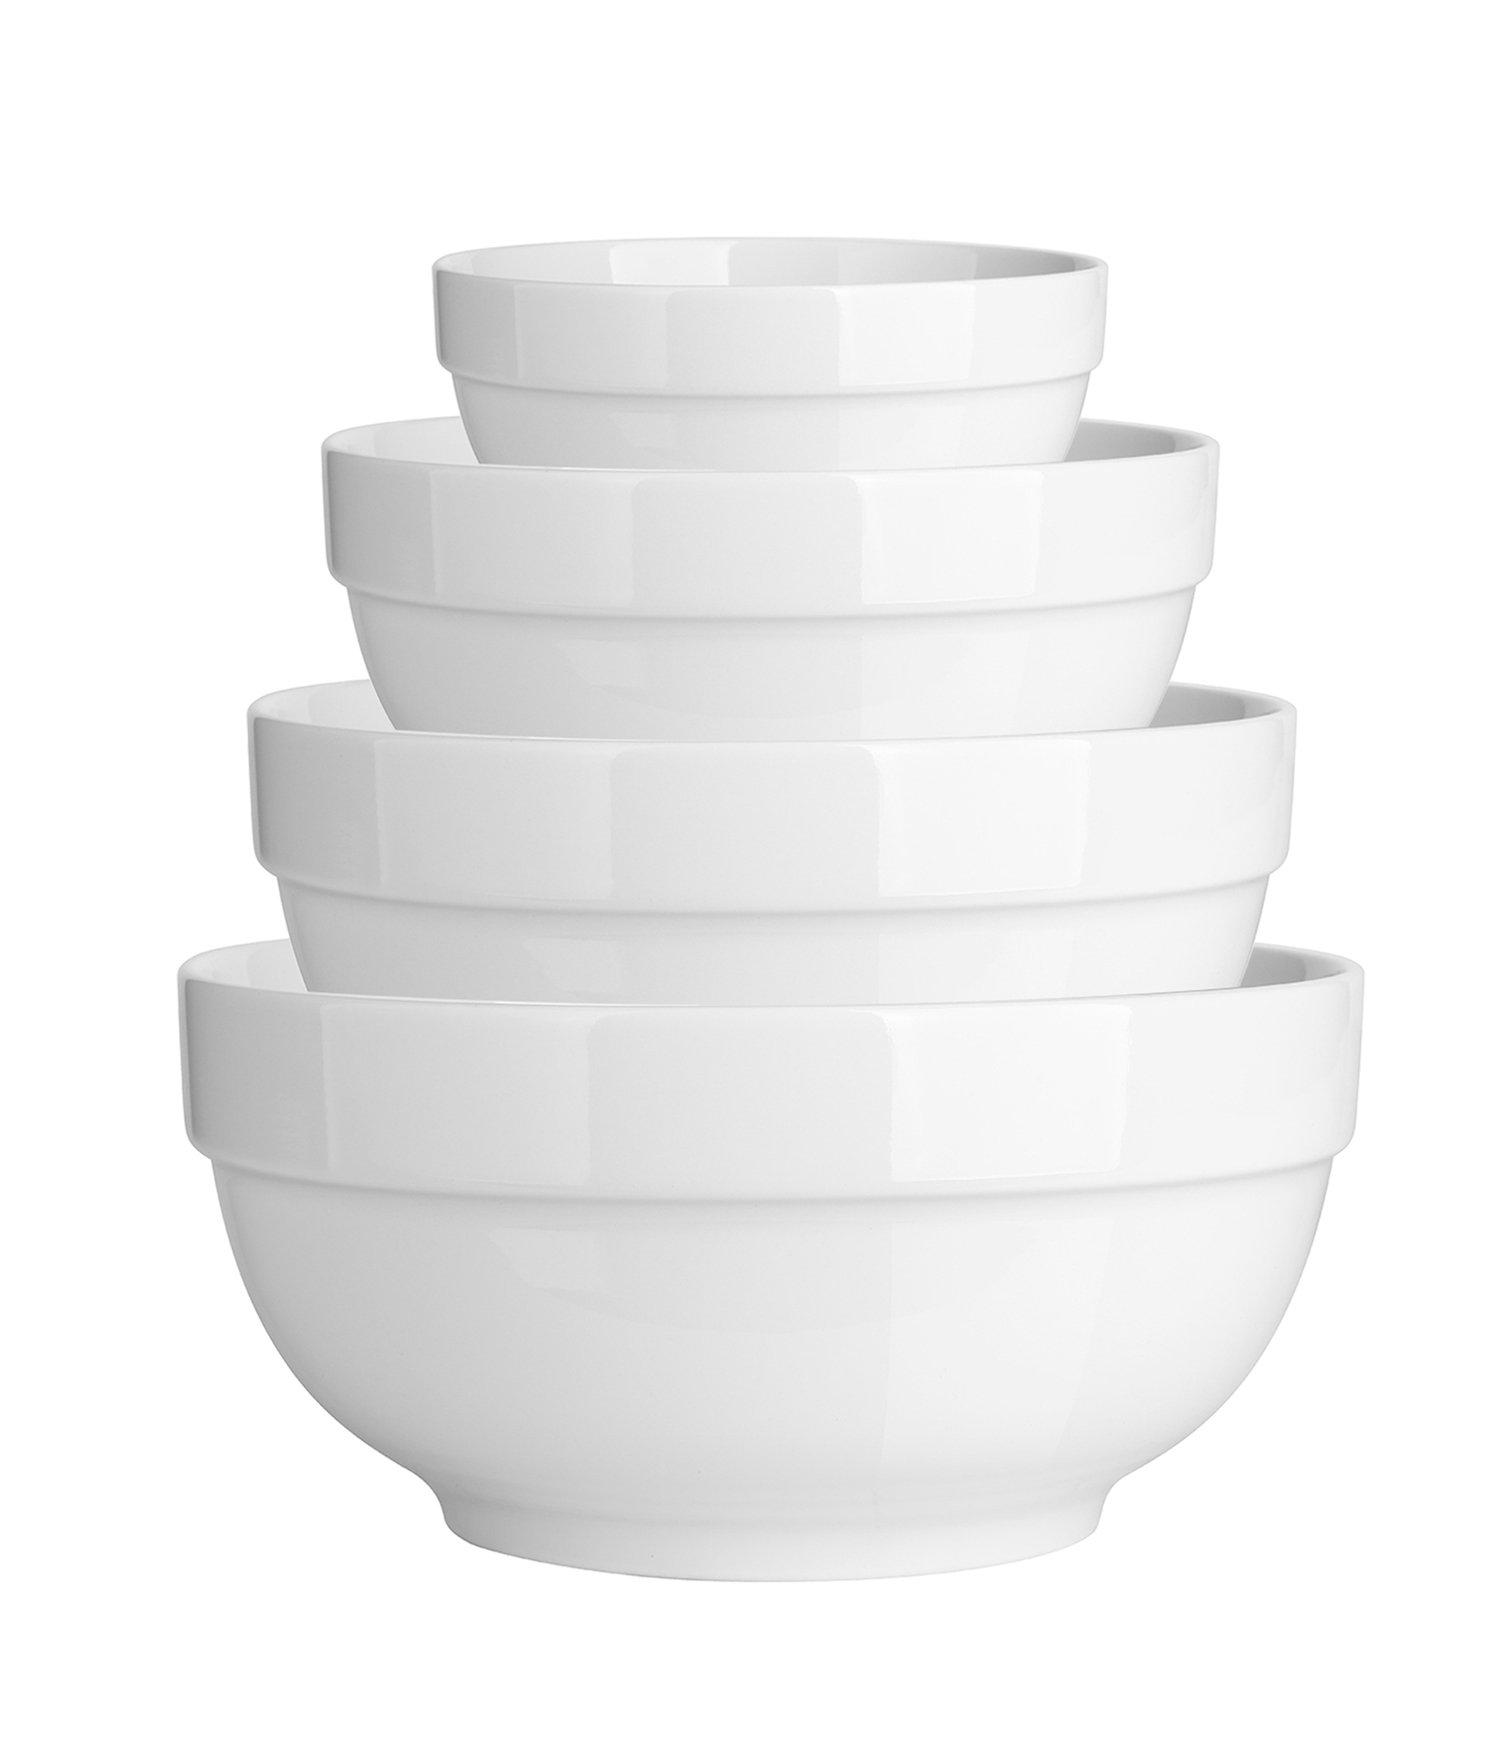 DOWAN 4-Piece Porcelain Serving/Mixing Bowl Set (Diameter:4.5''-5.5''-7''-8''), Anti-slipping Nesting Bowls